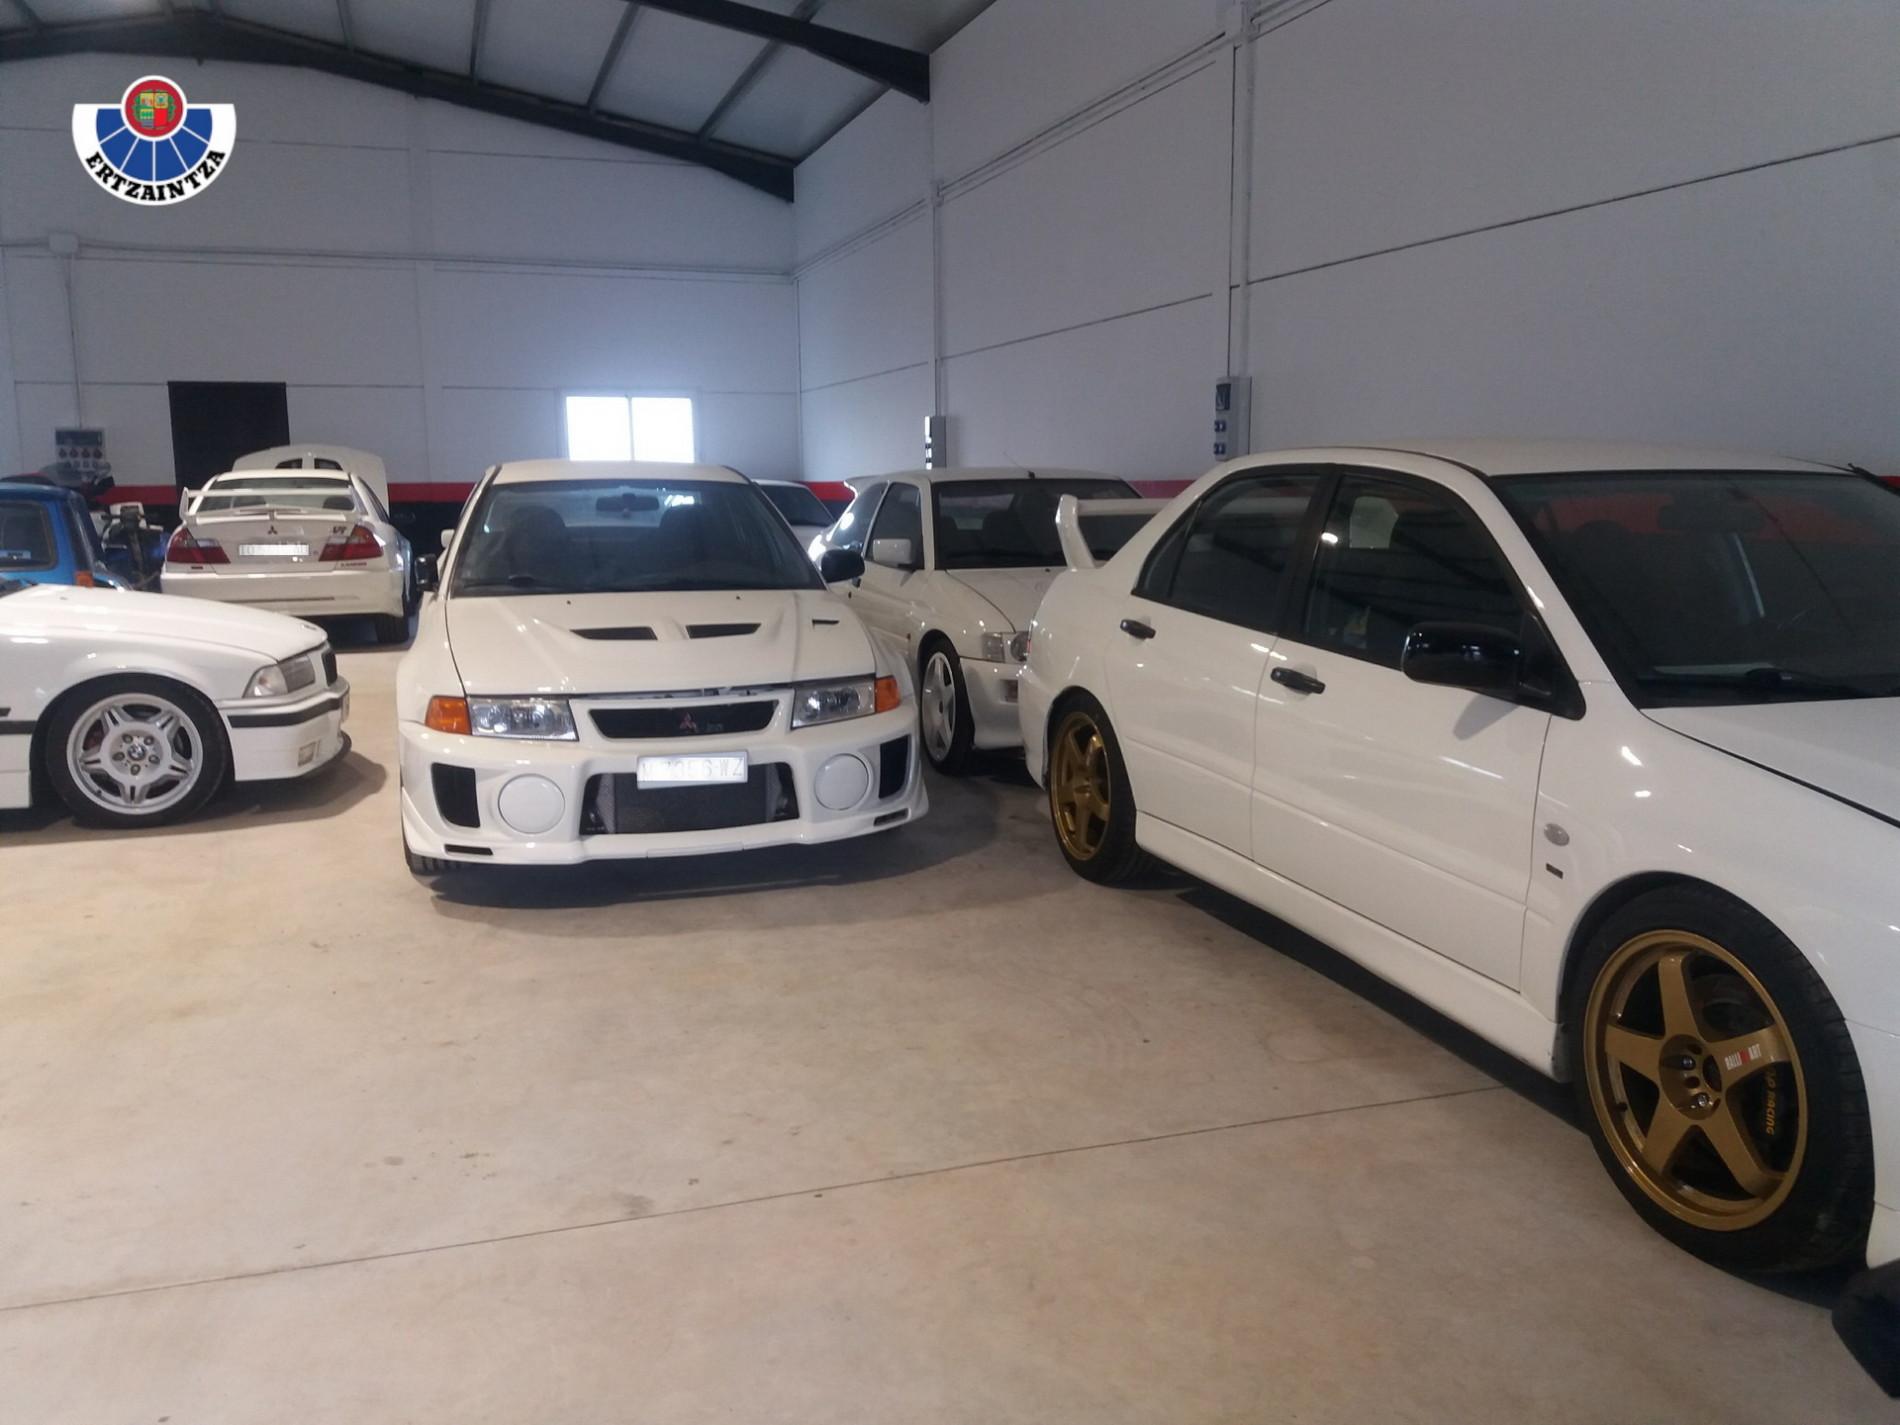 26 de masini furate - 26 de masini furate